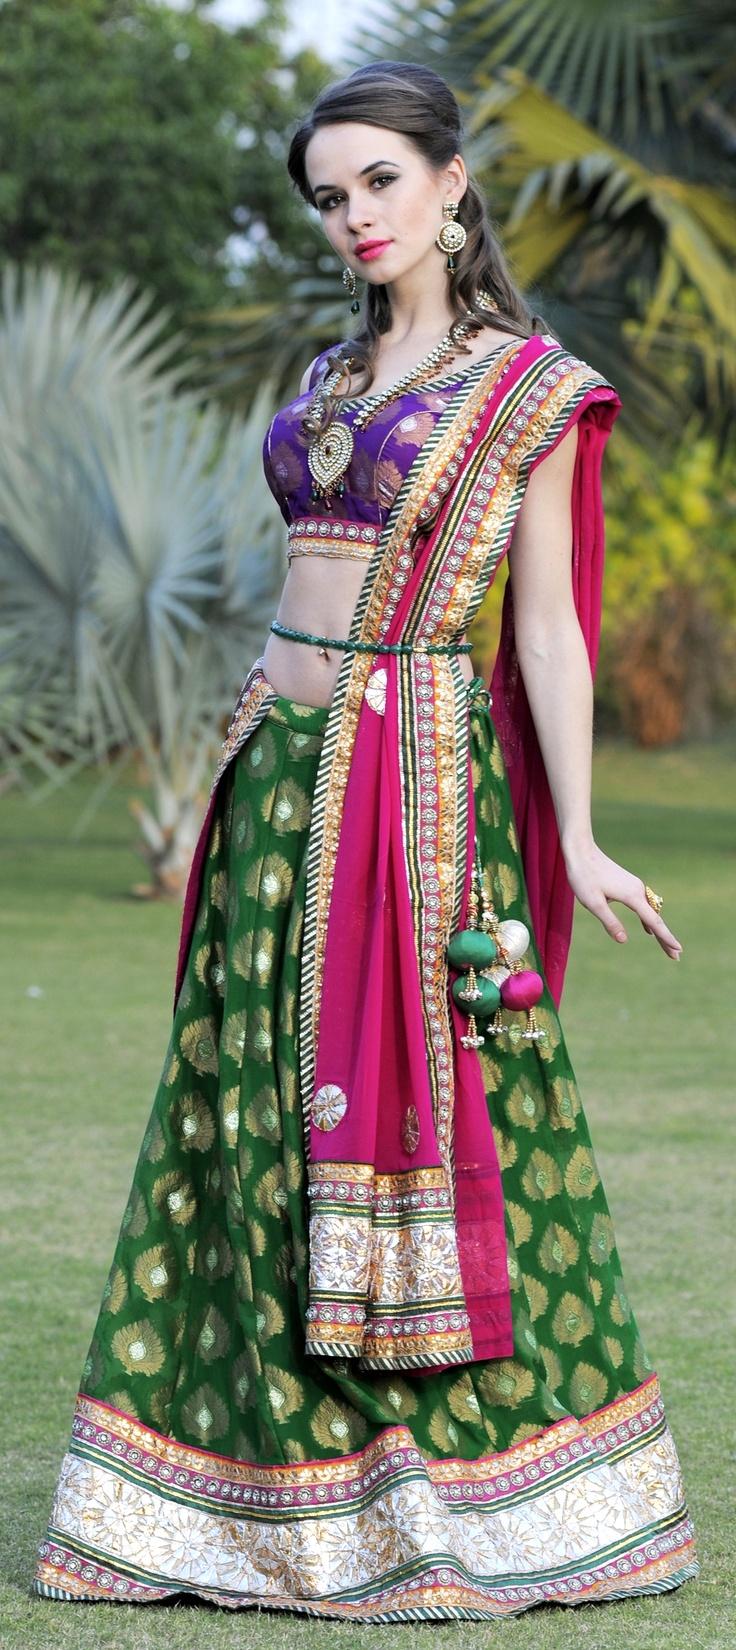 206 Best Bollywood Fashion Images On Pinterest India